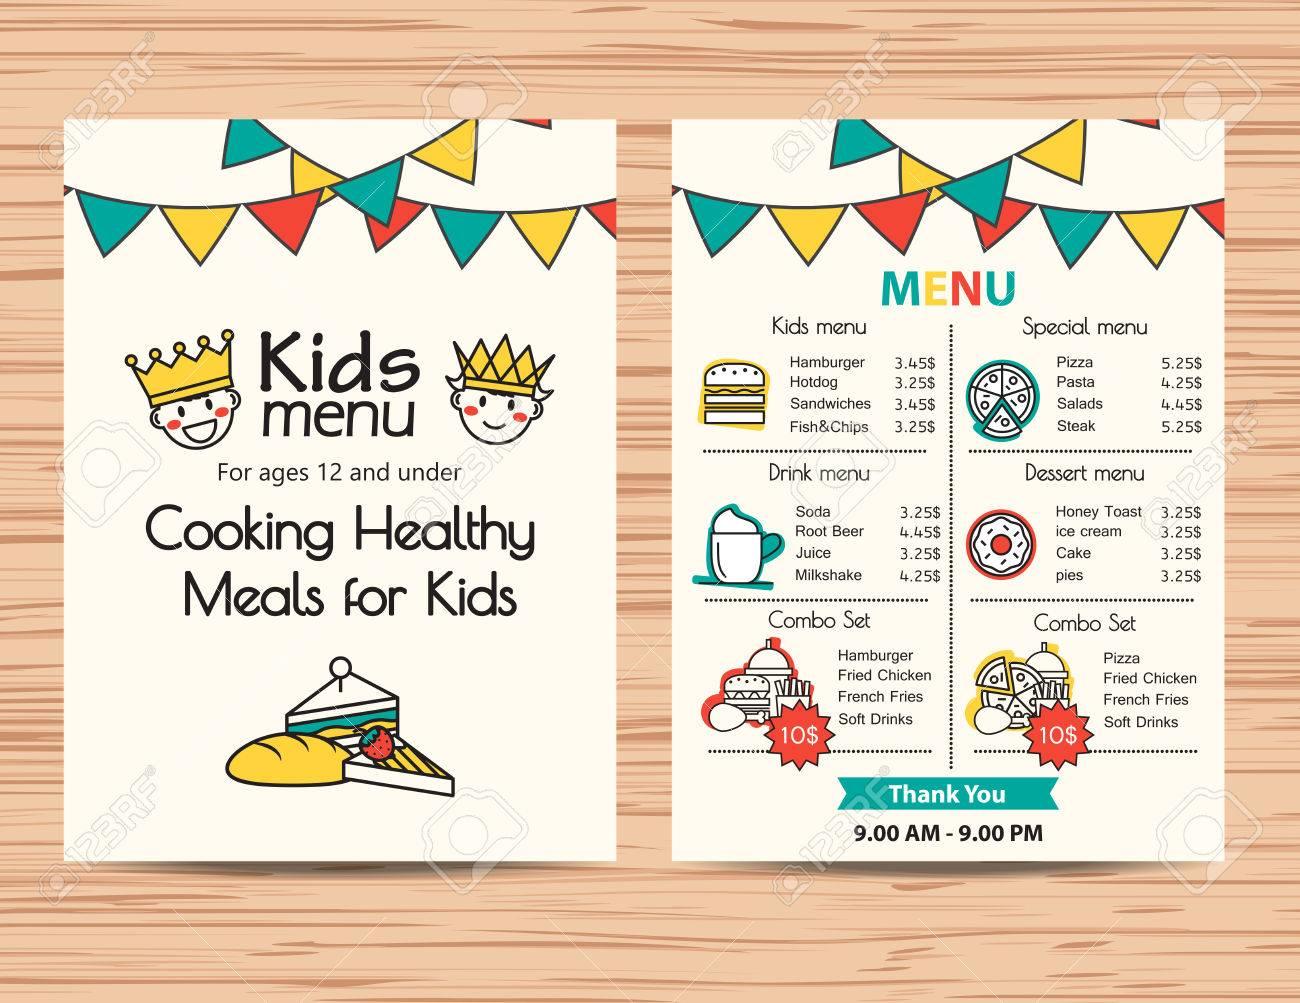 Design Templates Menu Sample Kids Menu Cto Job Description Resume 48358764  Kids Meal Menu Vector Template